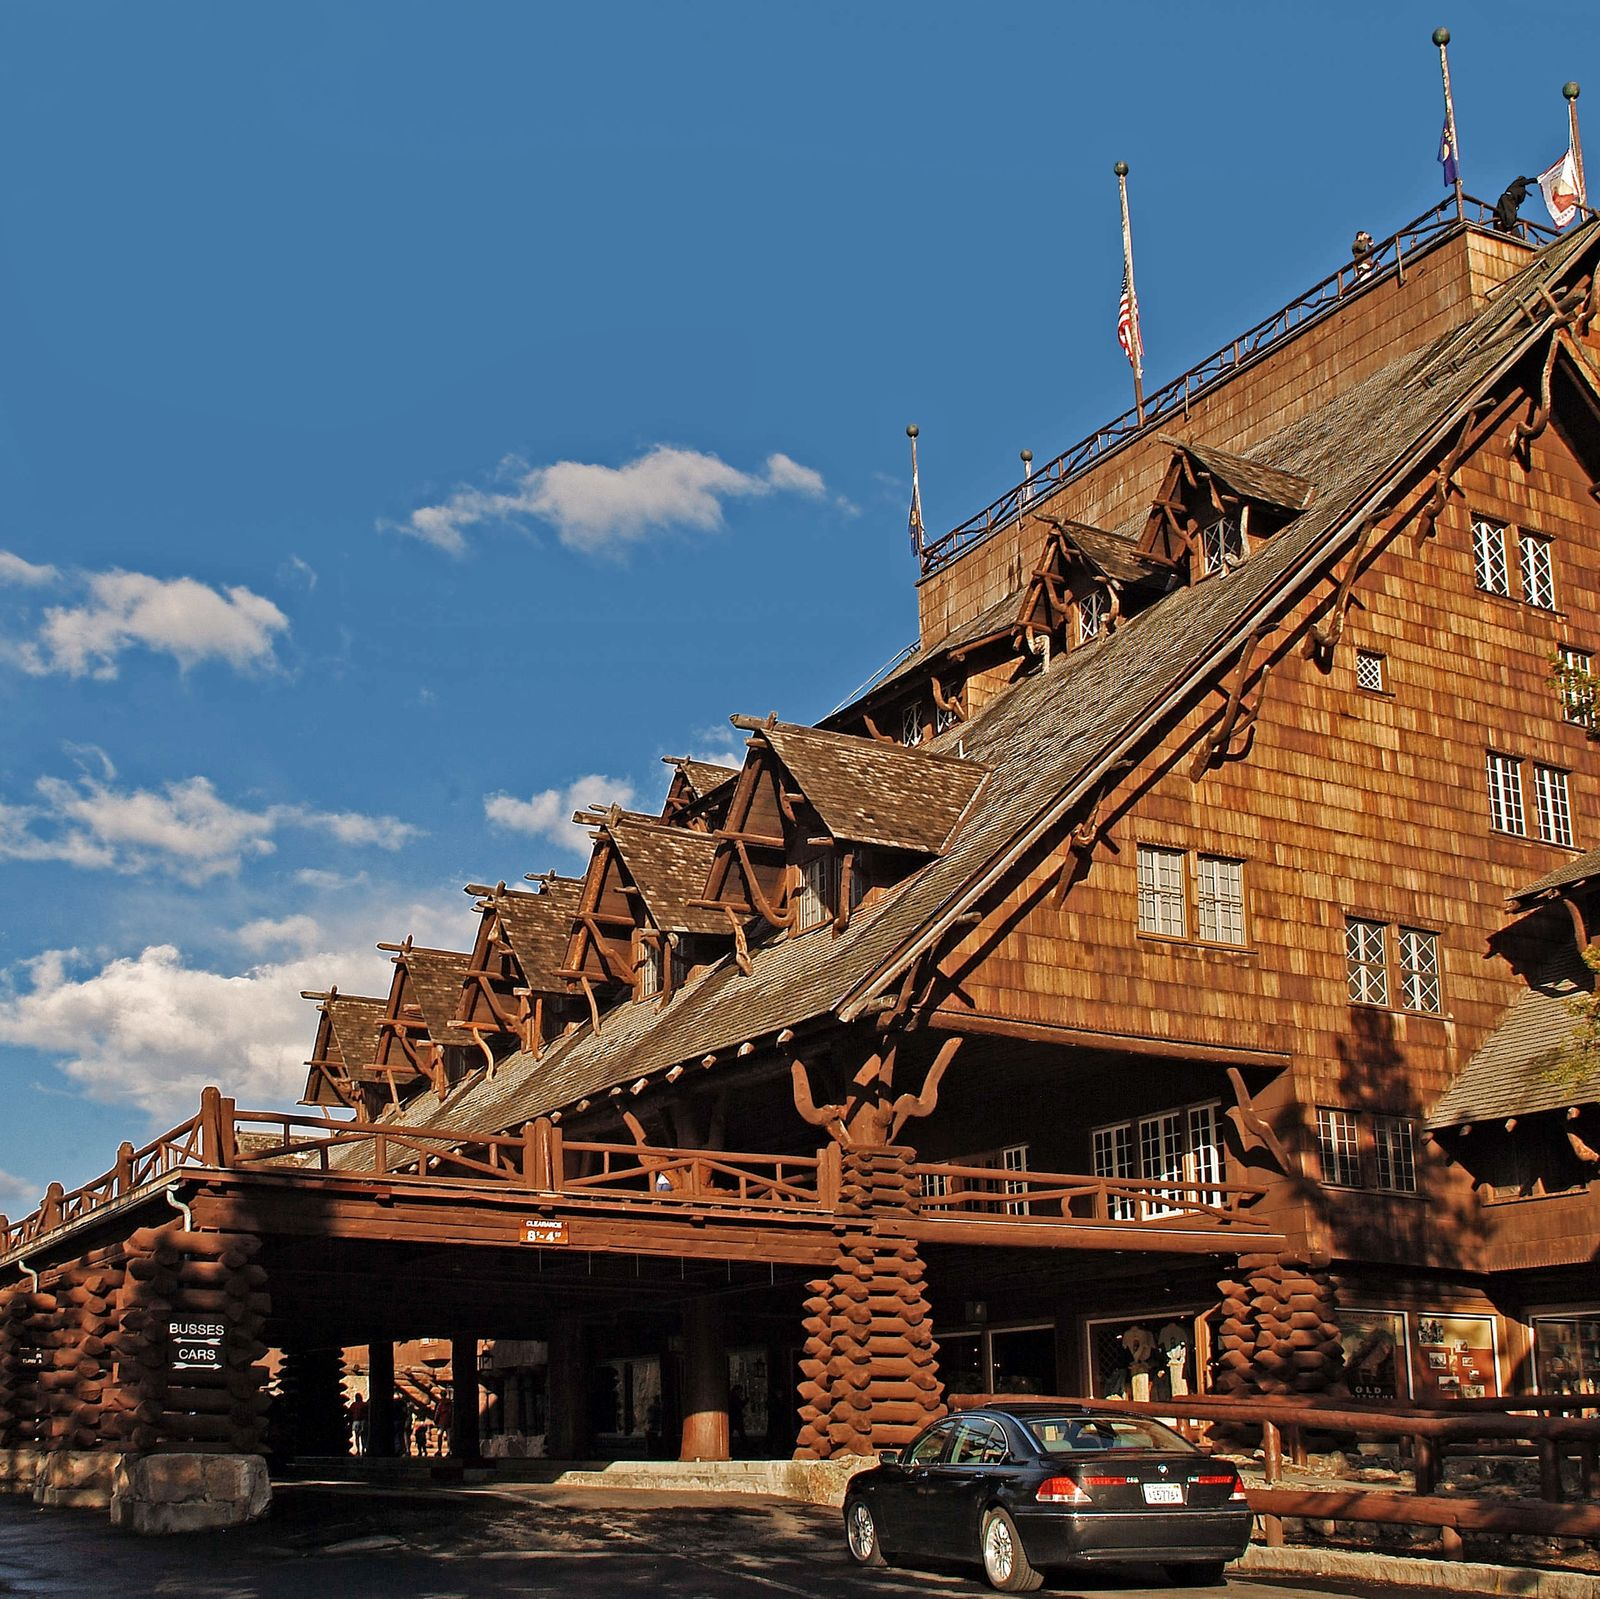 Hotel Wyoming Old Faithful Inn Canusa